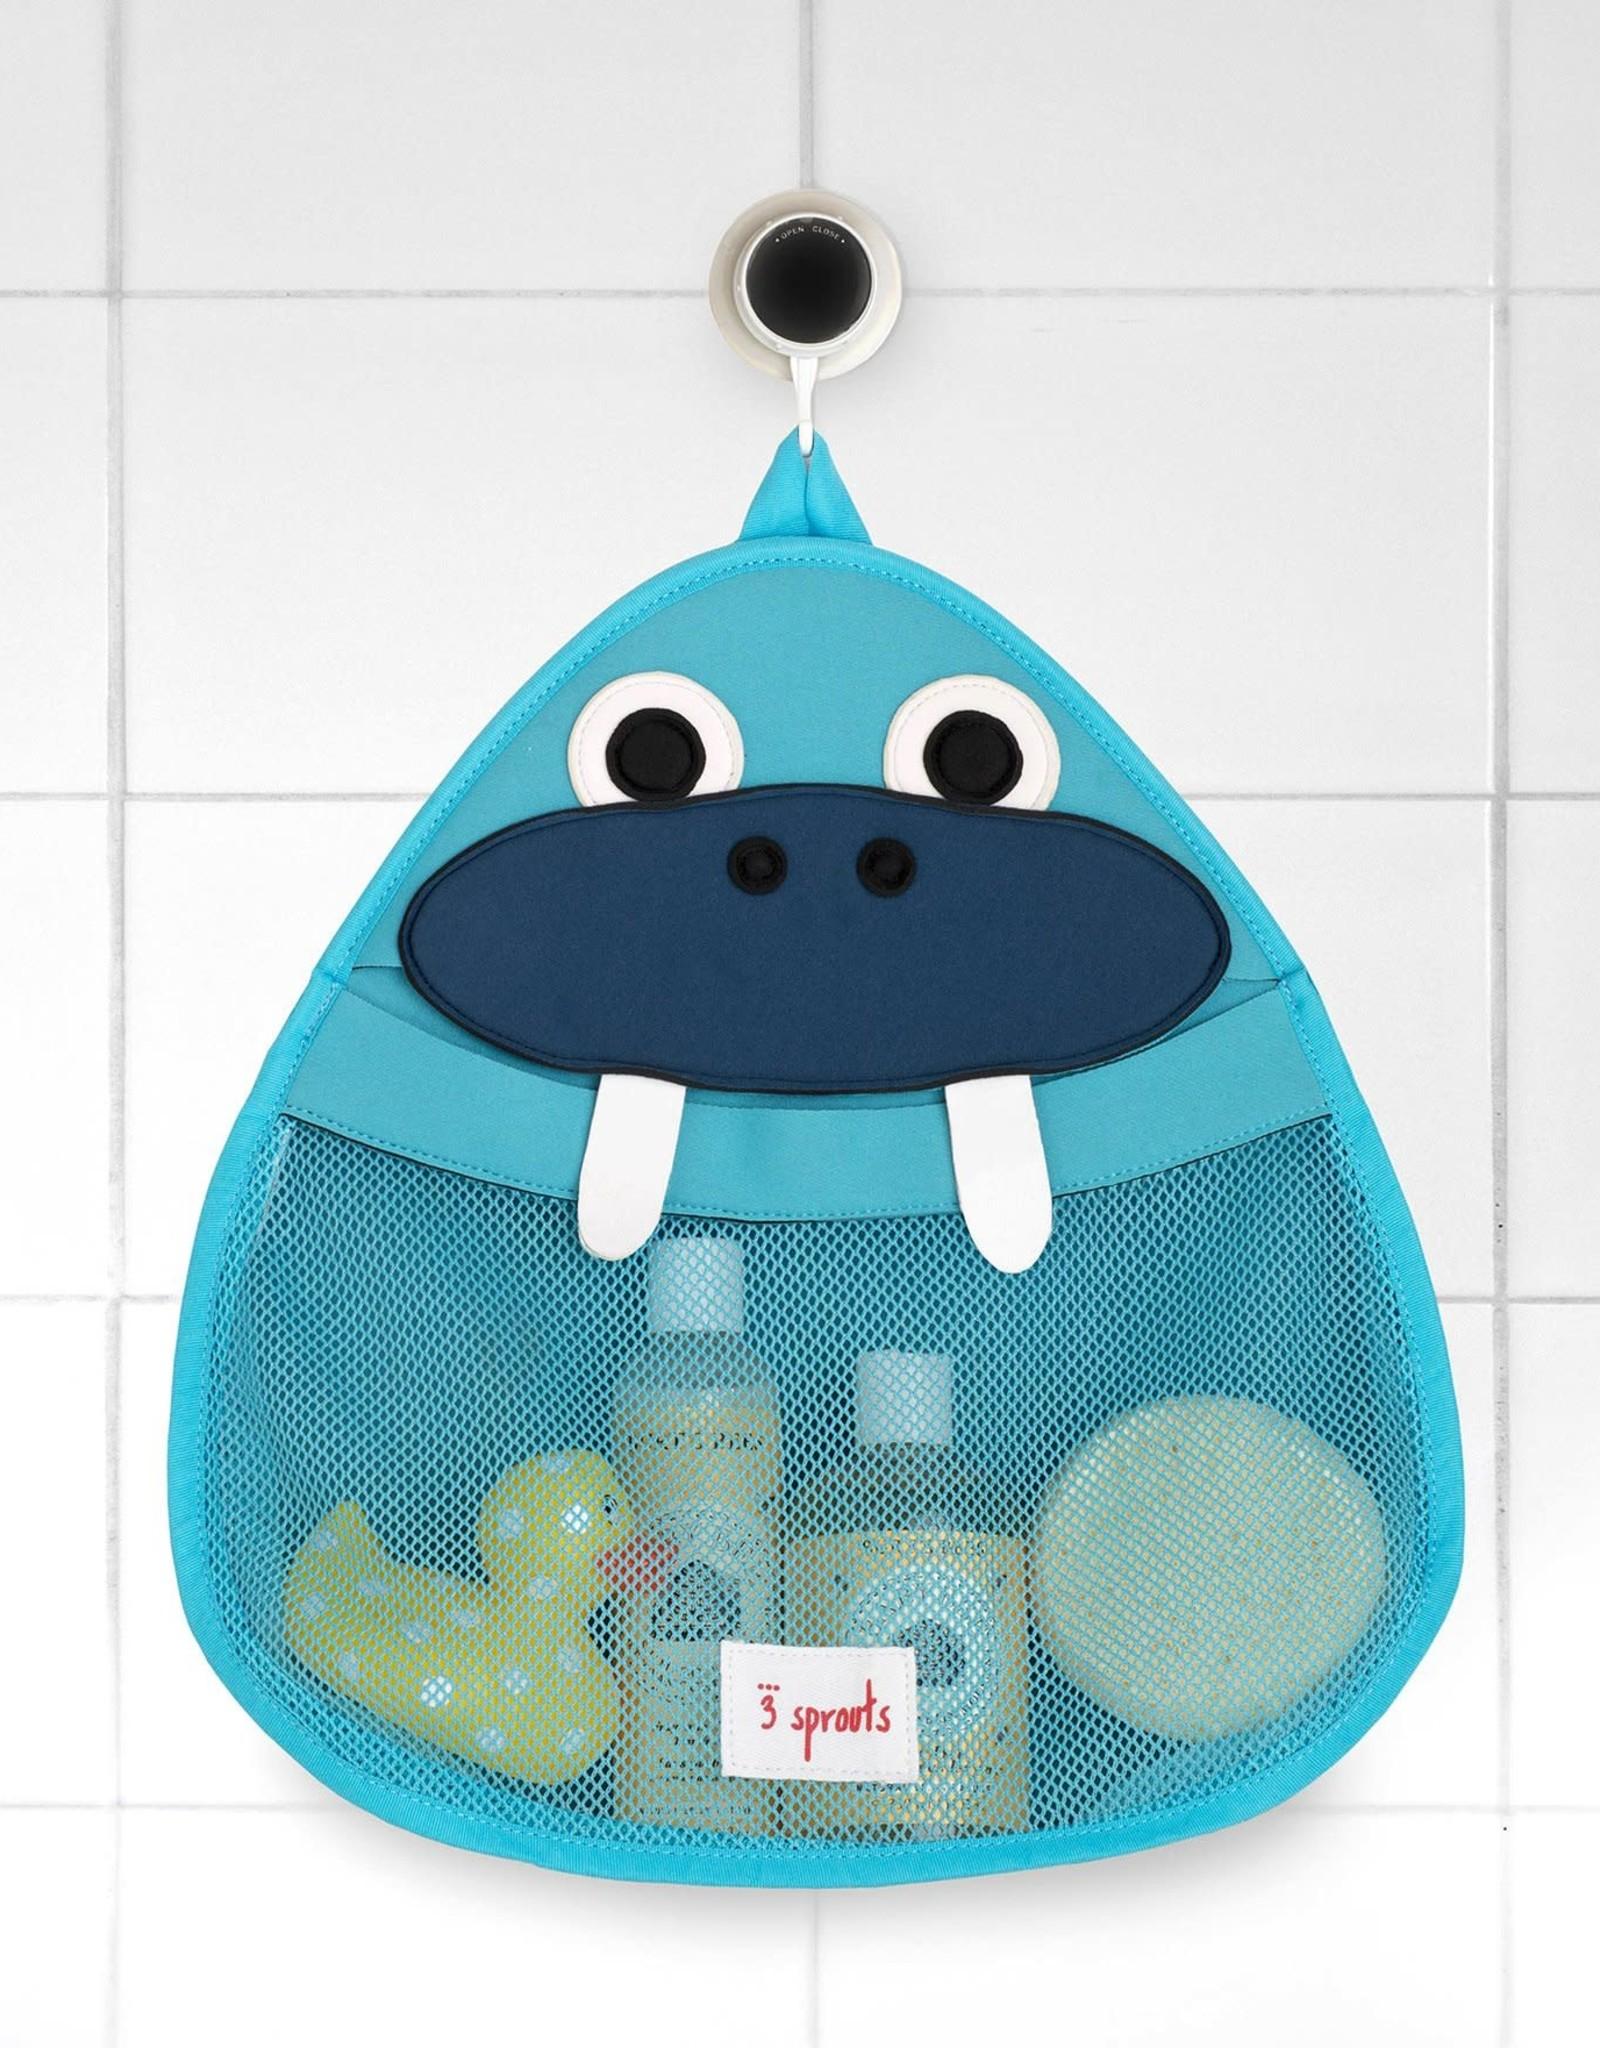 3 Sprouts Walrus Bath Toy Storage Bag